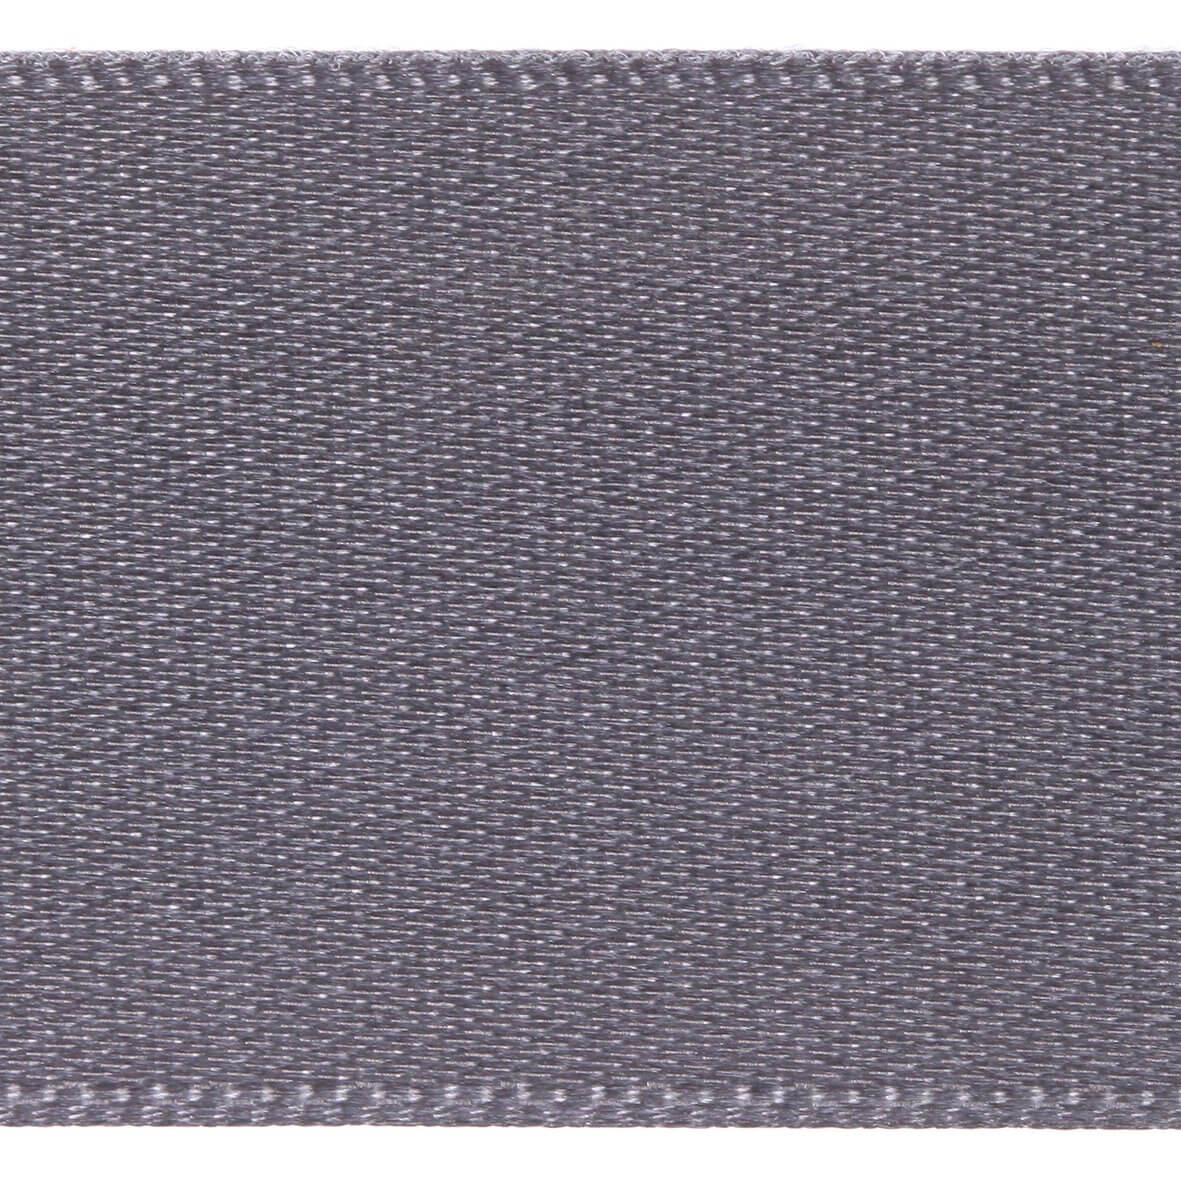 25mm Berisfords Satin Ribbon - Smoked Grey Colour 669